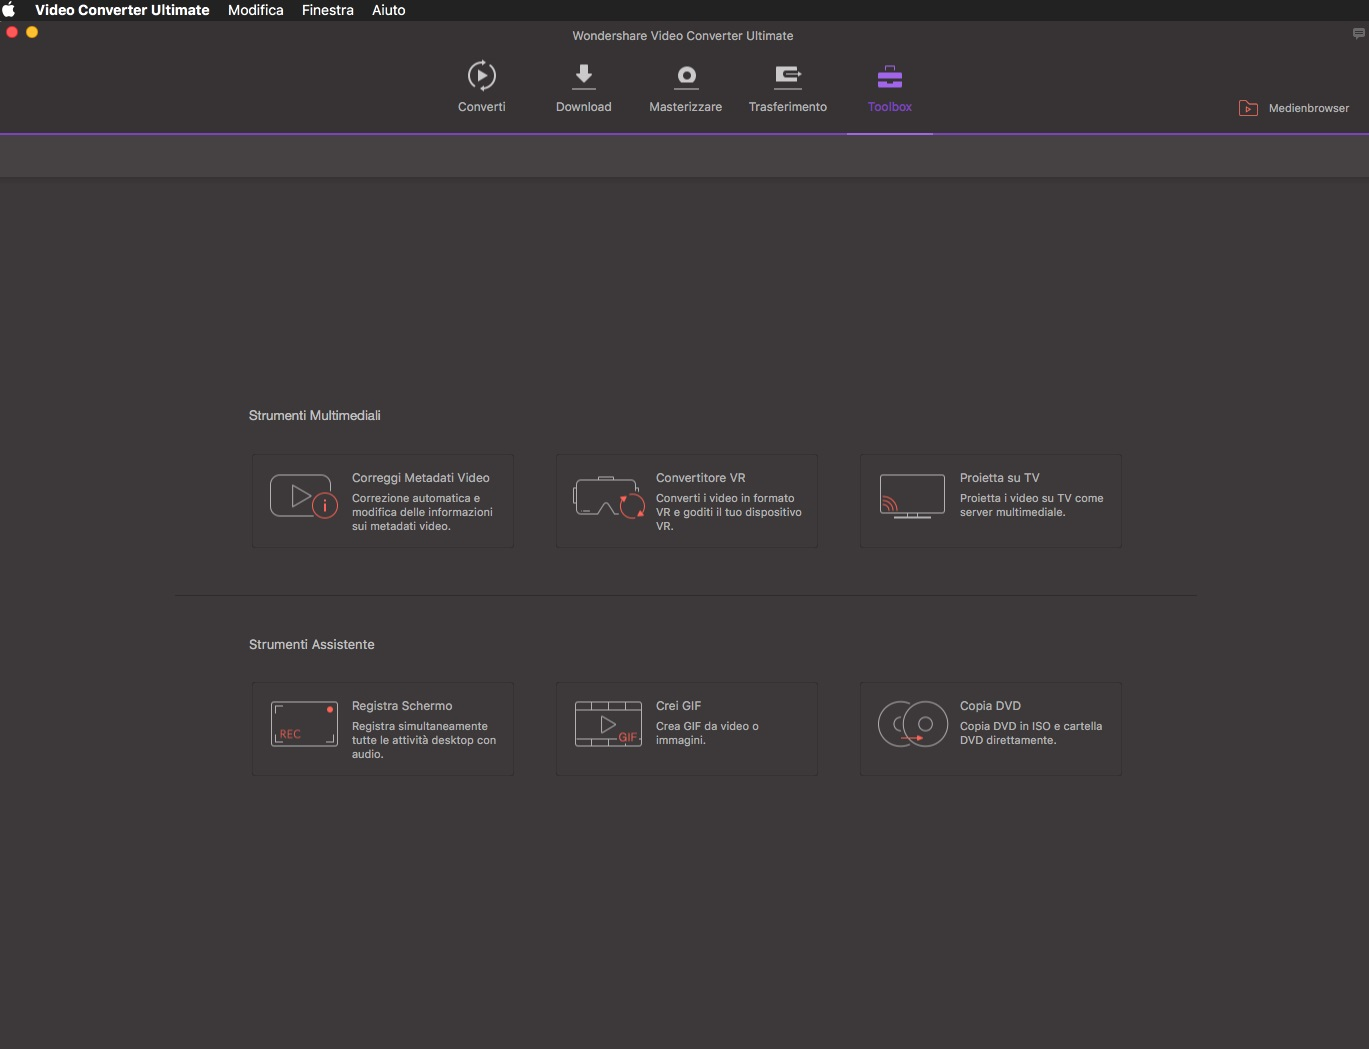 [MAC] Wondershare UniConverter v11.0.1.8 macOS - ITA